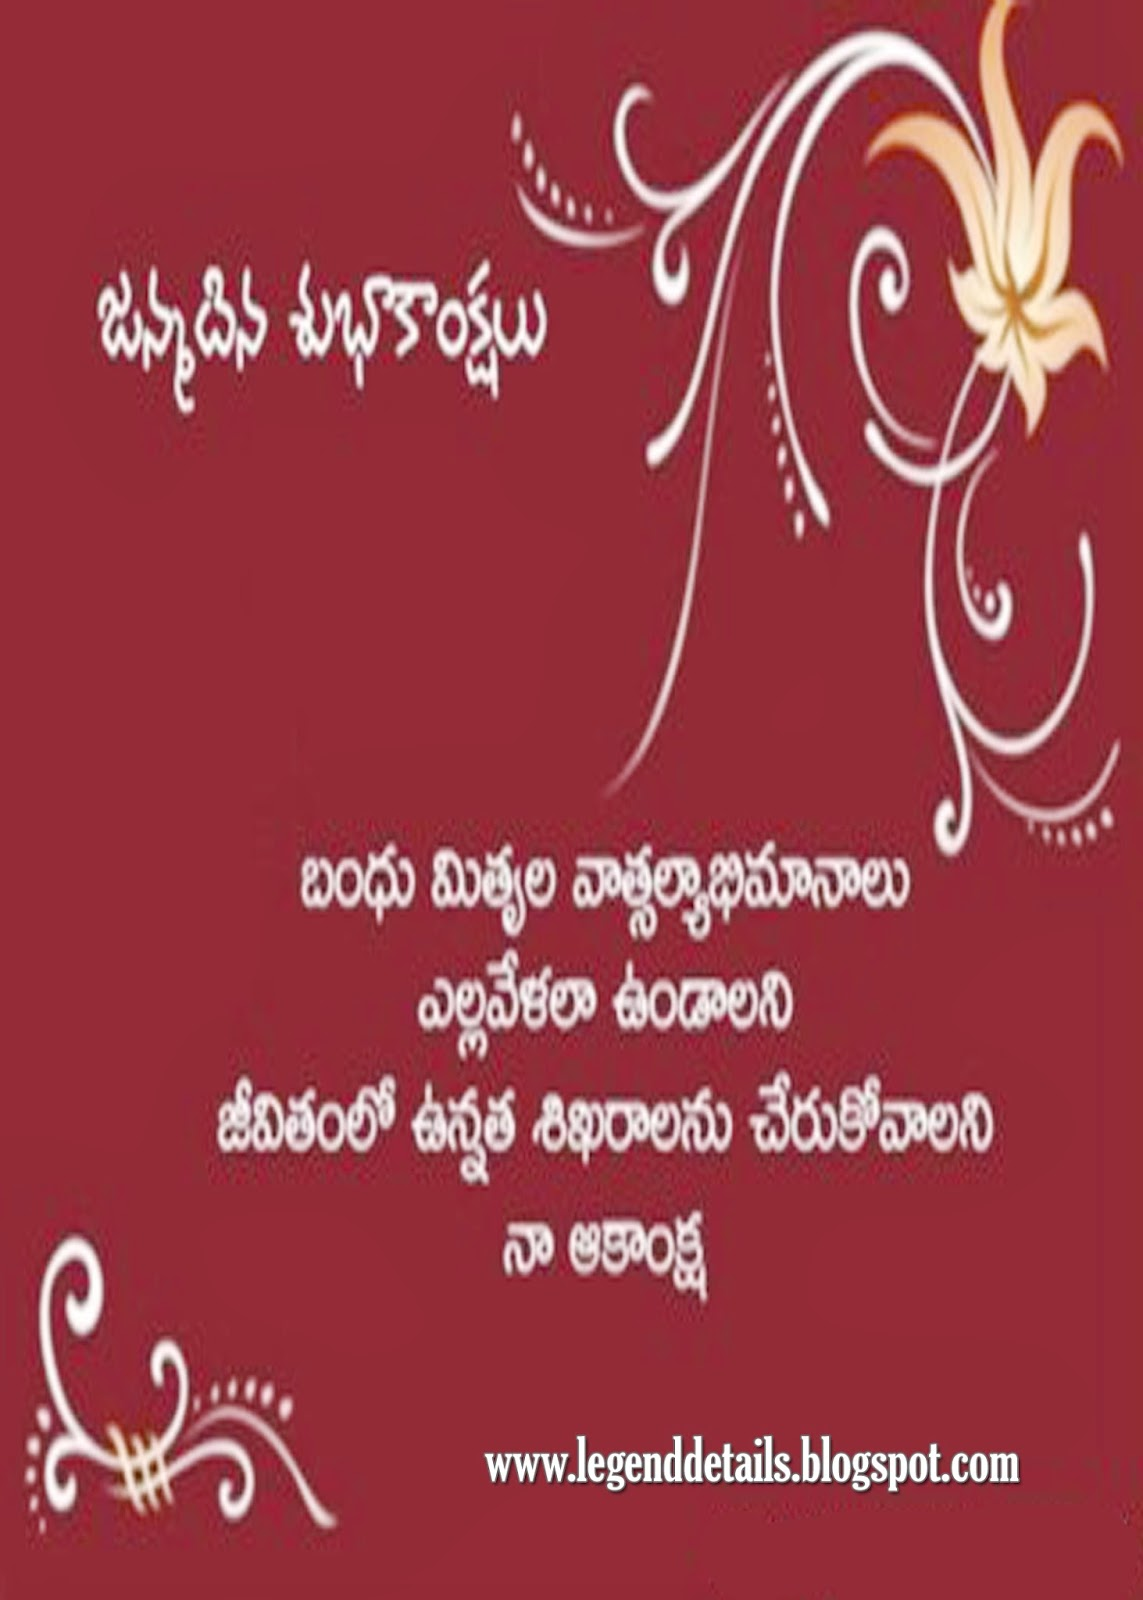 Birth Day Greetings In Telugu Free Subhakankshalu with Images – Telugu Birthday Greetings